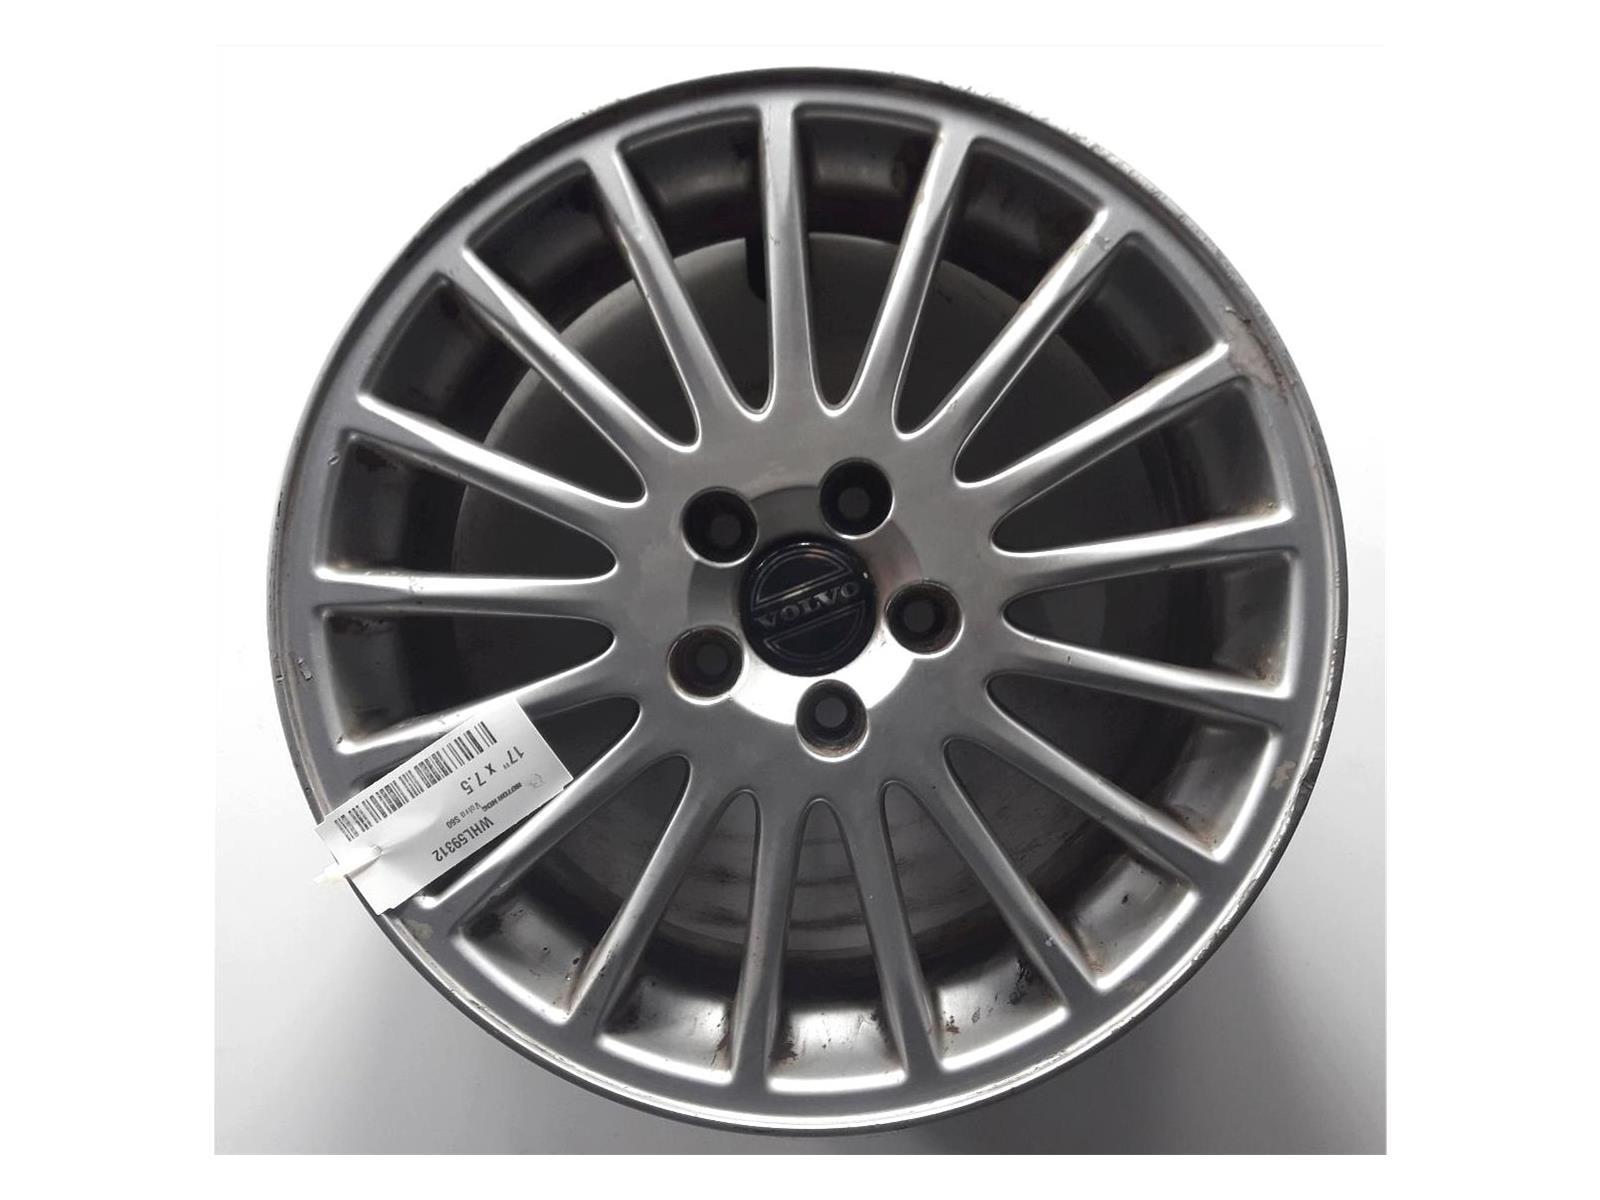 ALLOY WHEEL Volvo S60 17 Inch Alloy Wheel Rim - WHL59312